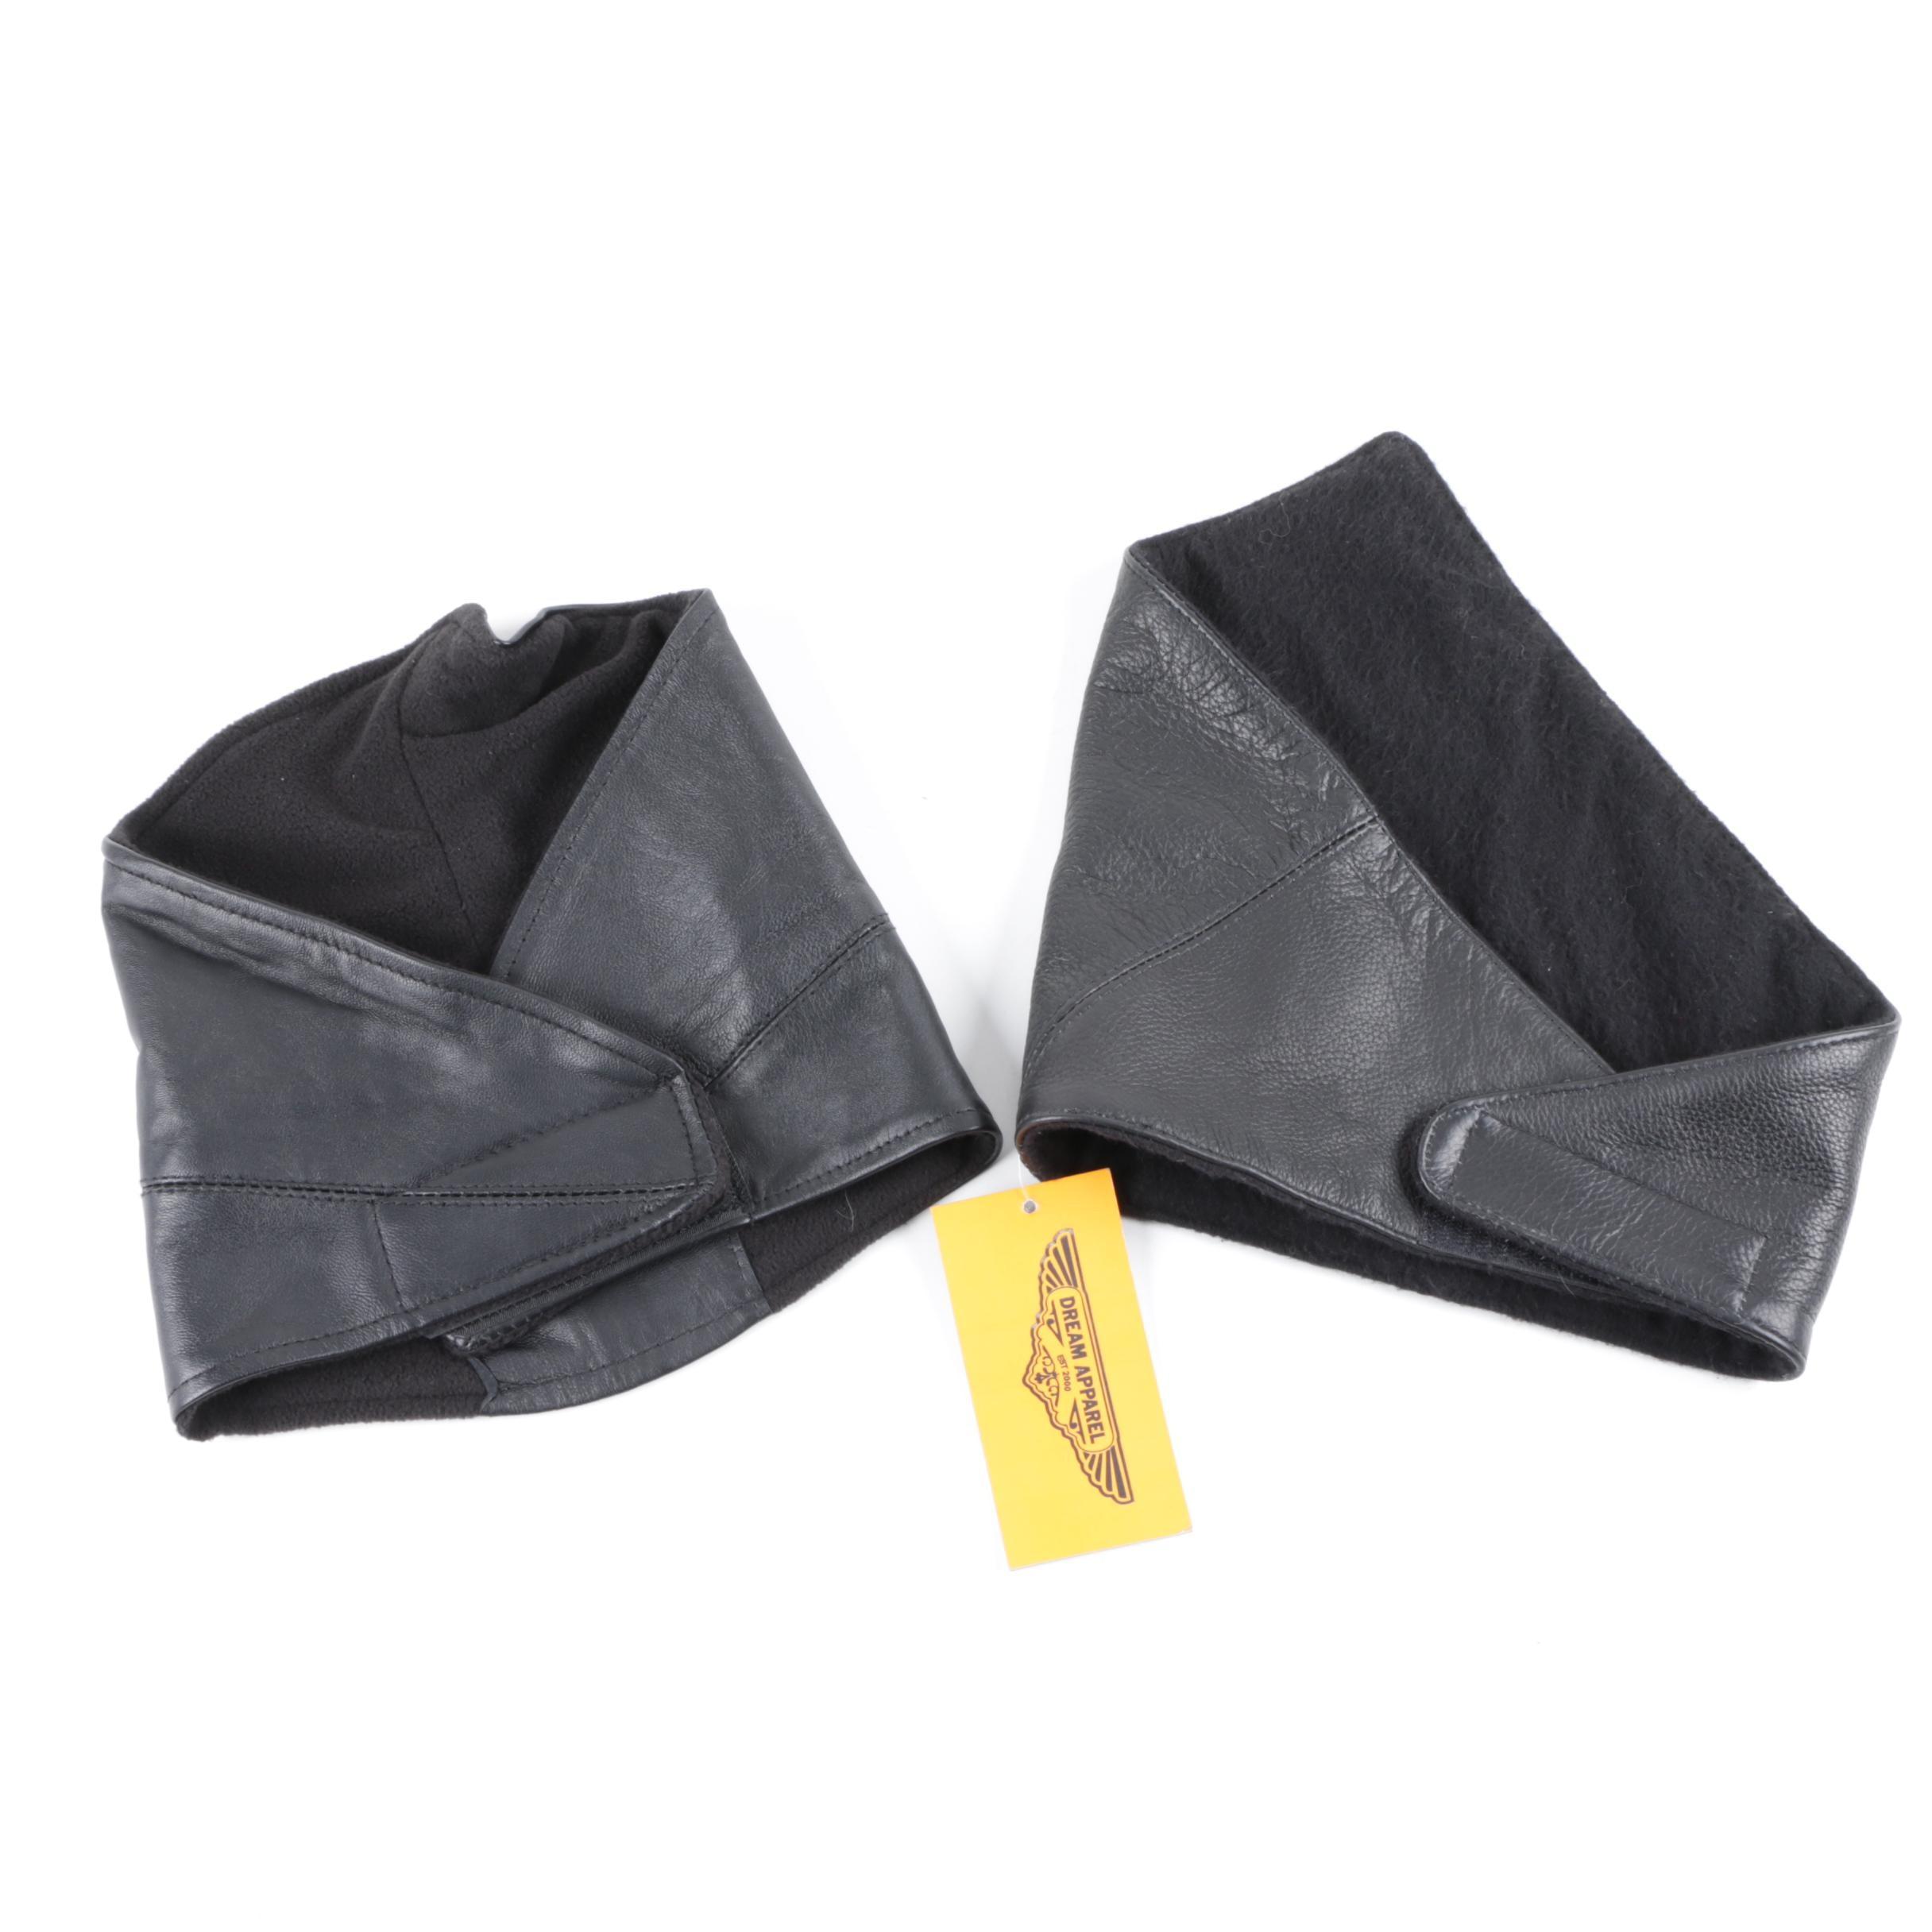 Dream Apparel Black Leather Motorcycle Half Masks